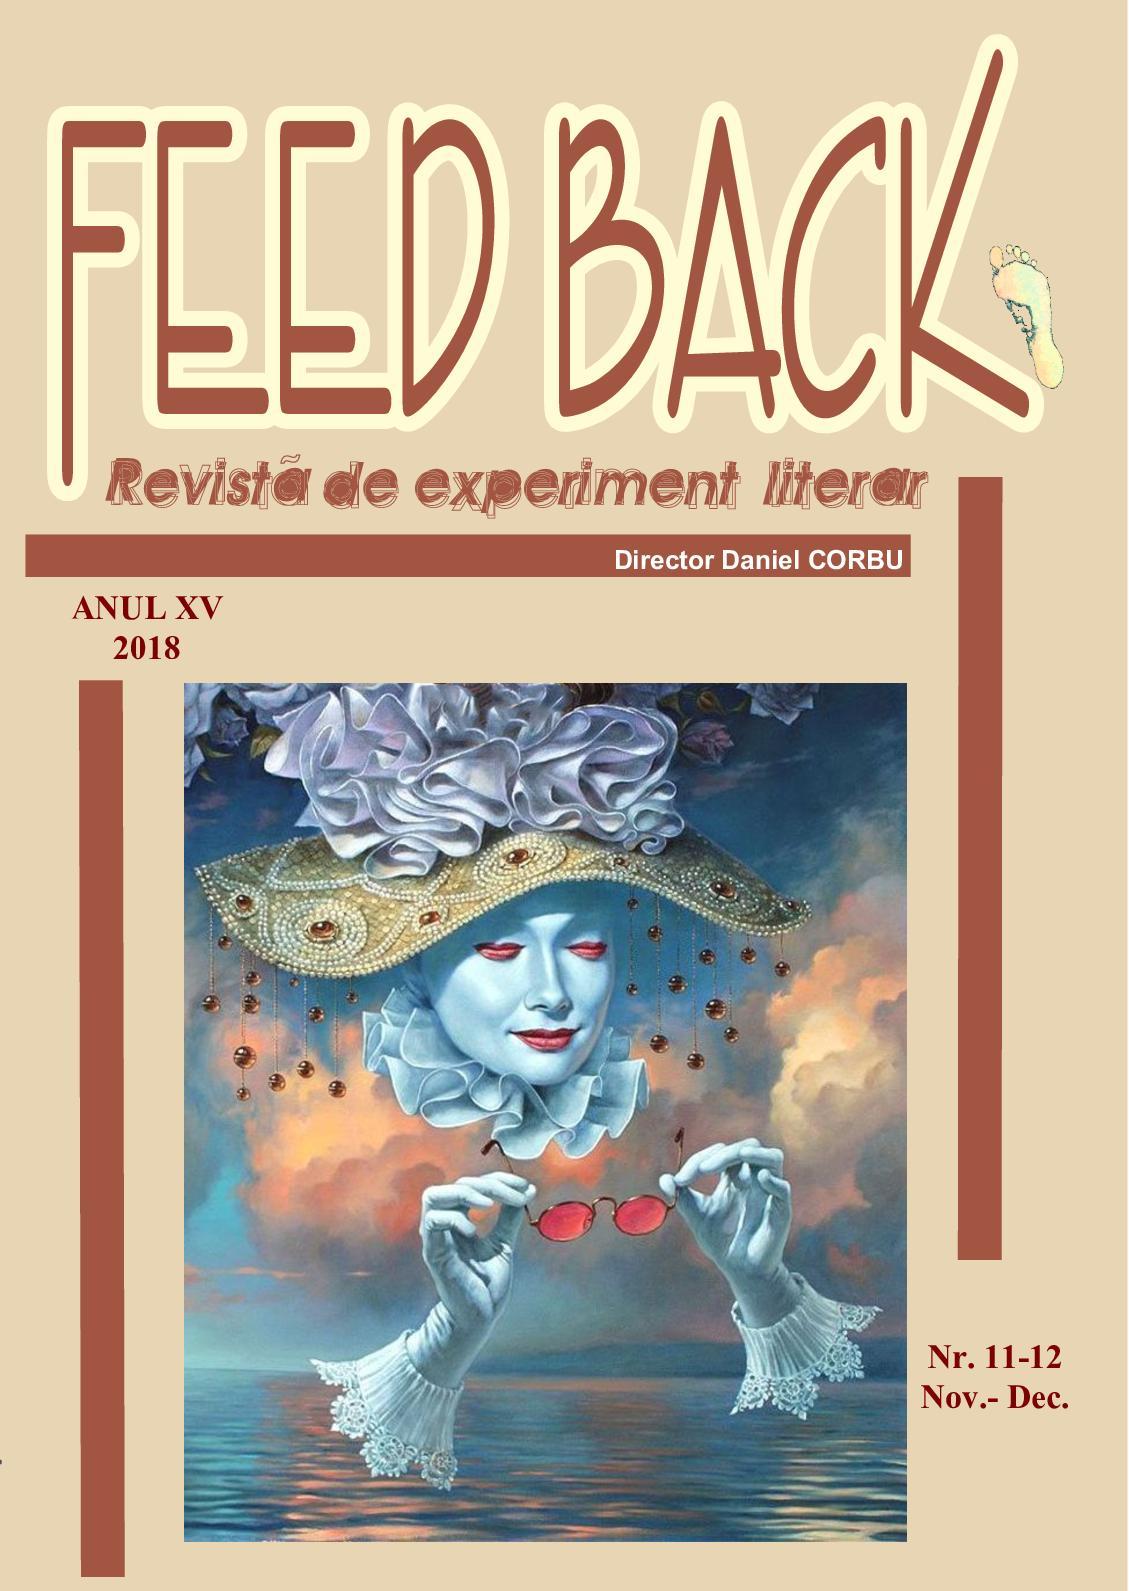 Calaméo - Revista Feed Back nr 11-12, 2018